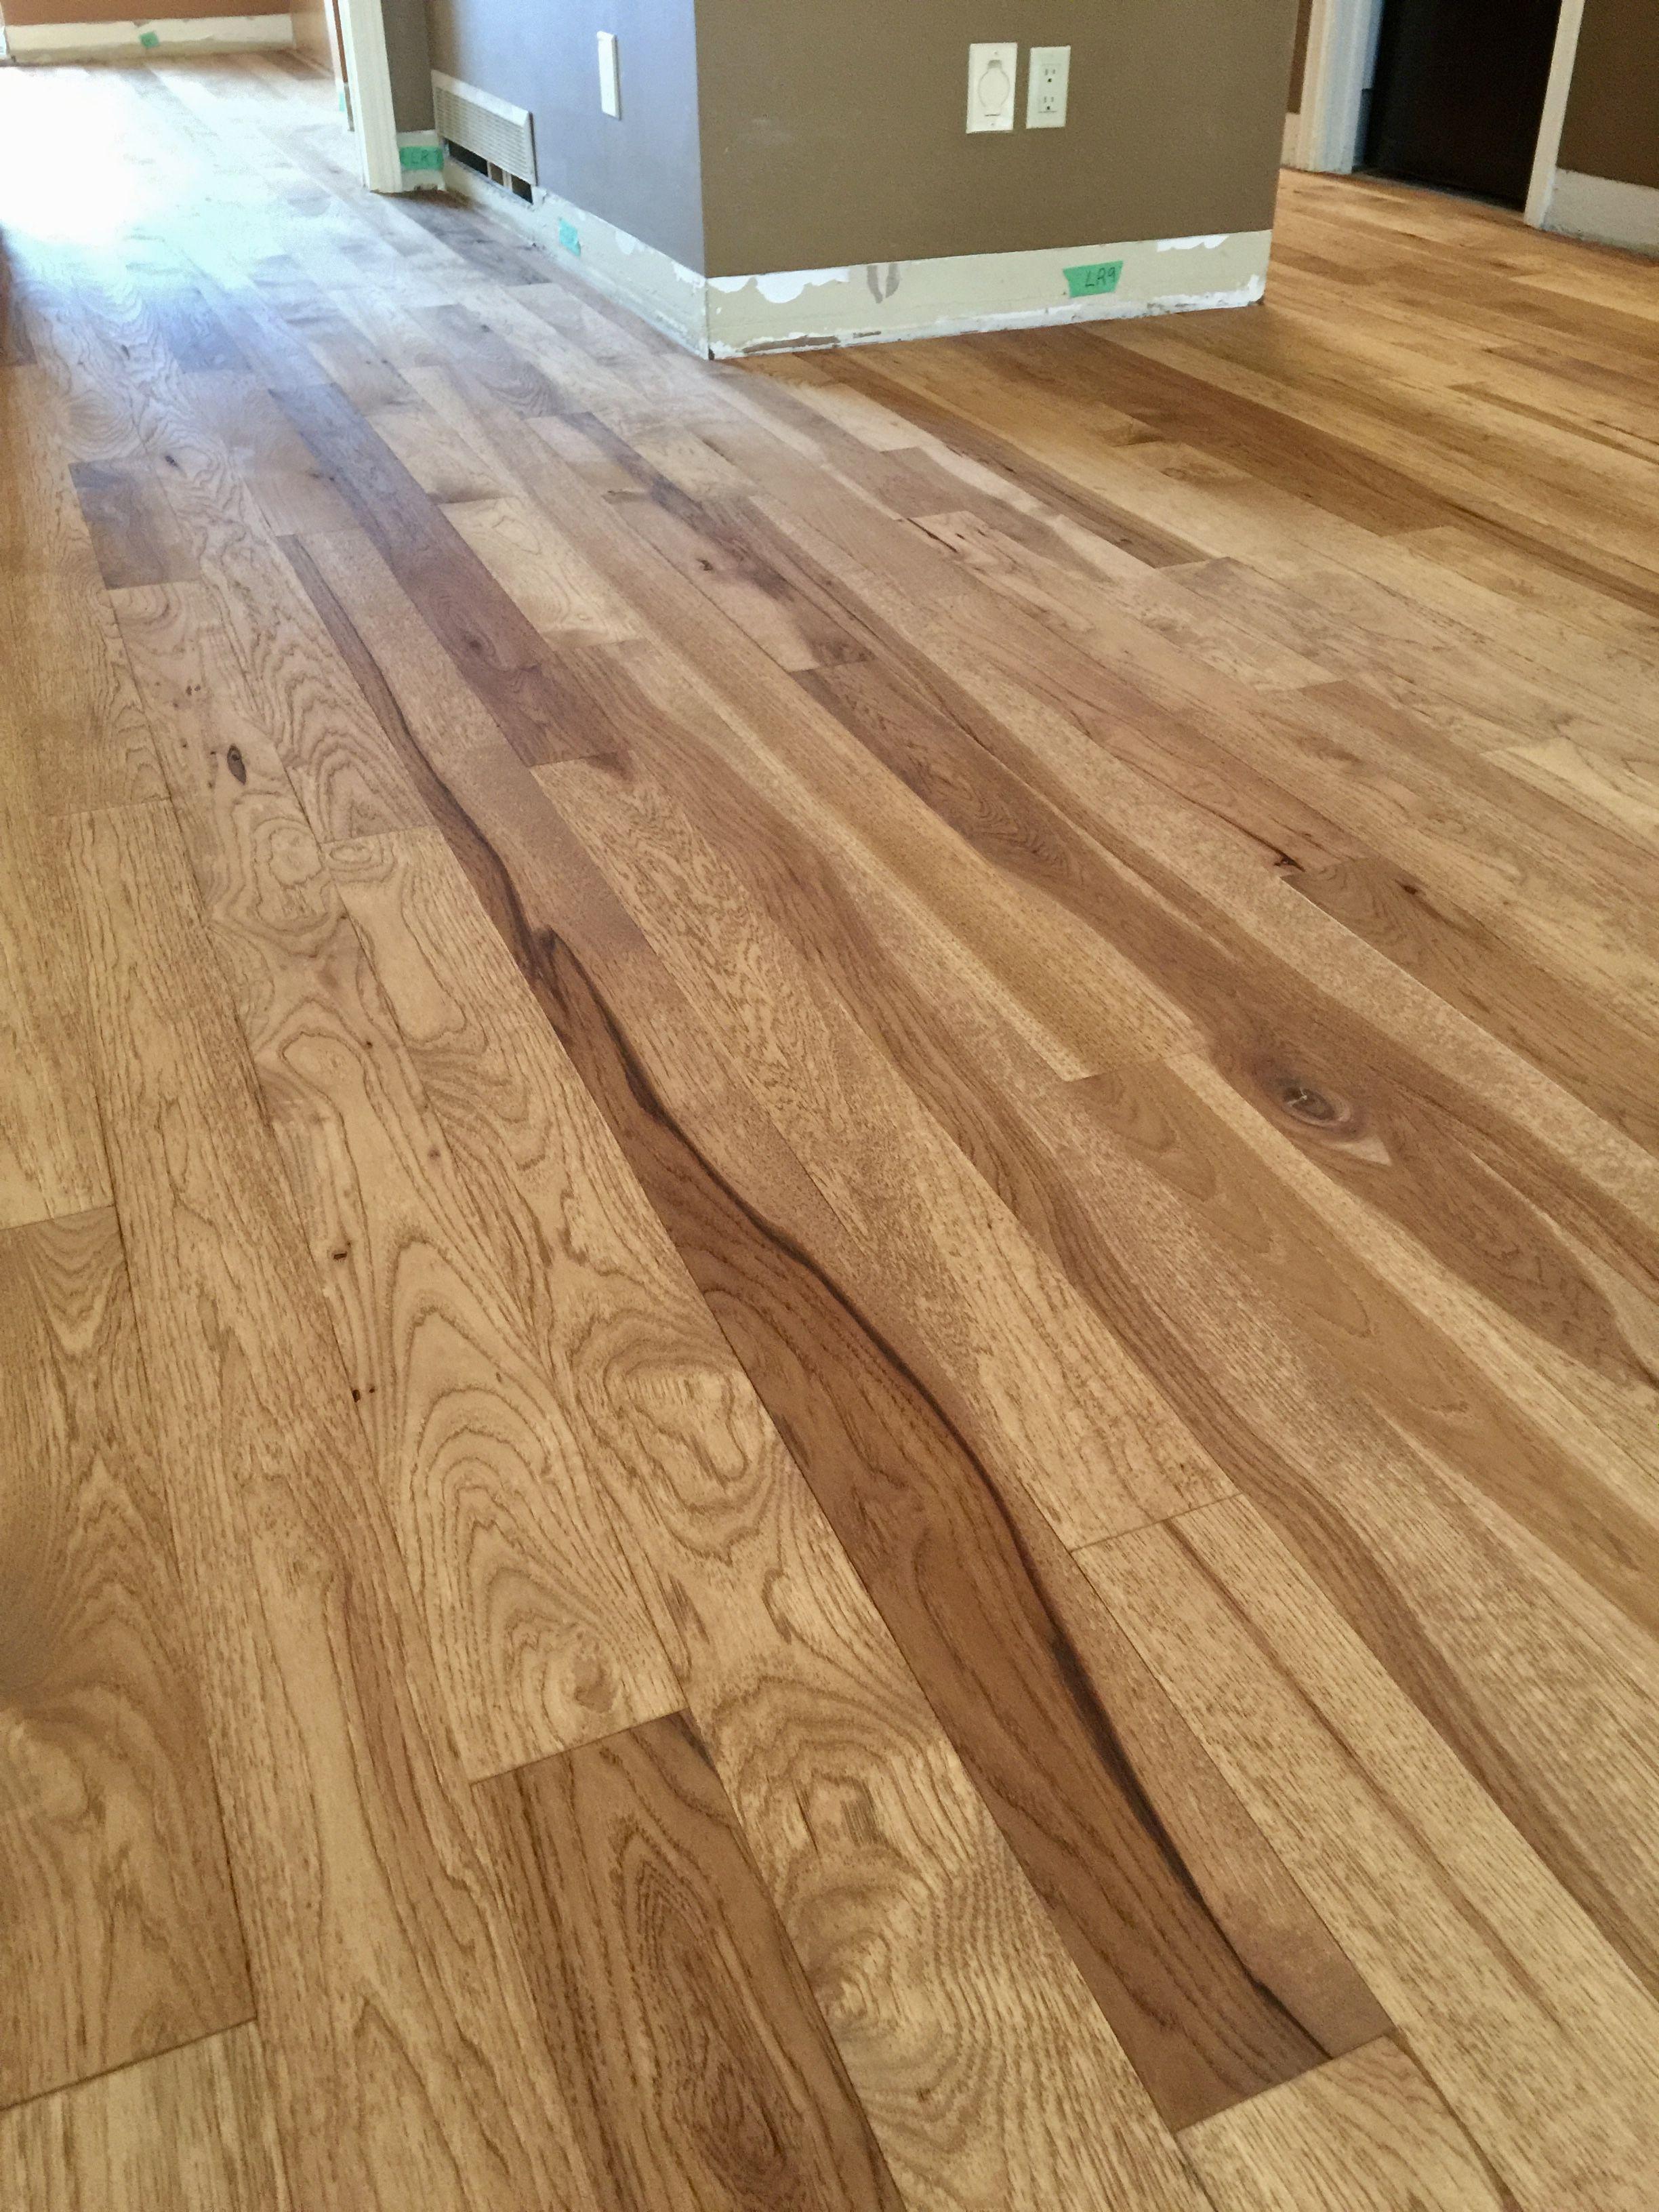 Are You Considering Installing Hardwood Floors Hardwood